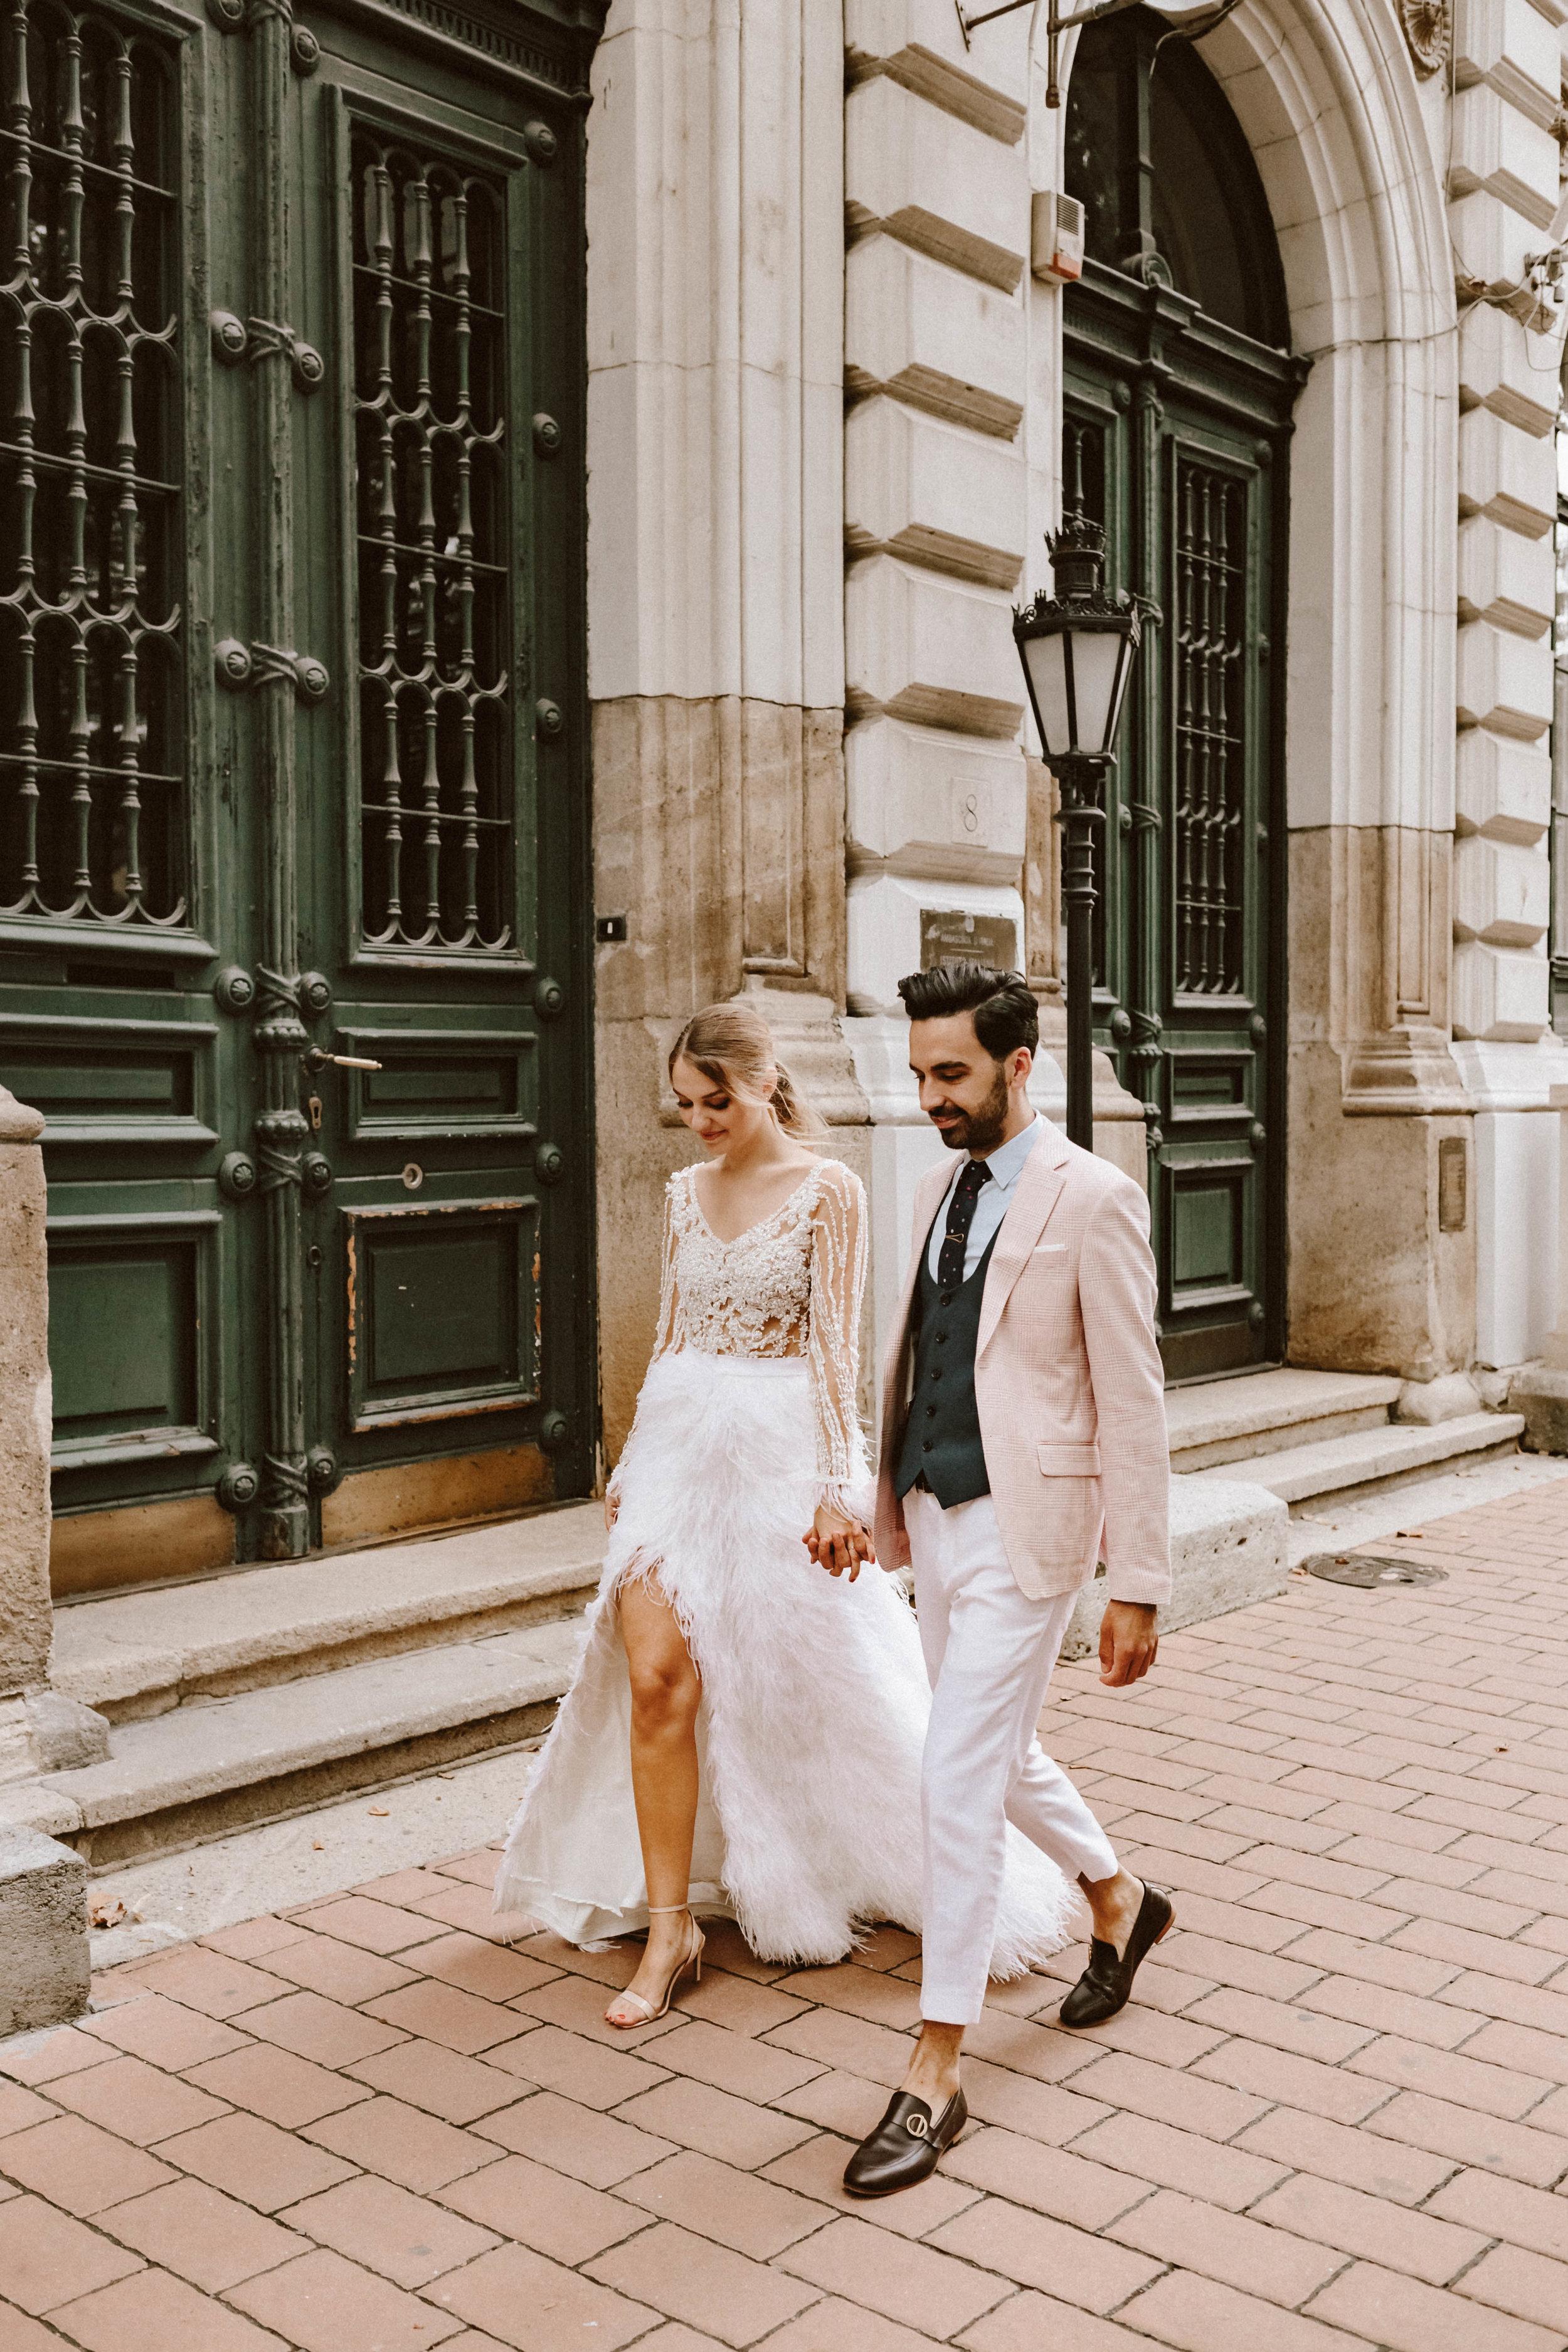 1819-Evelin+Peti-wedding-076-w.jpg